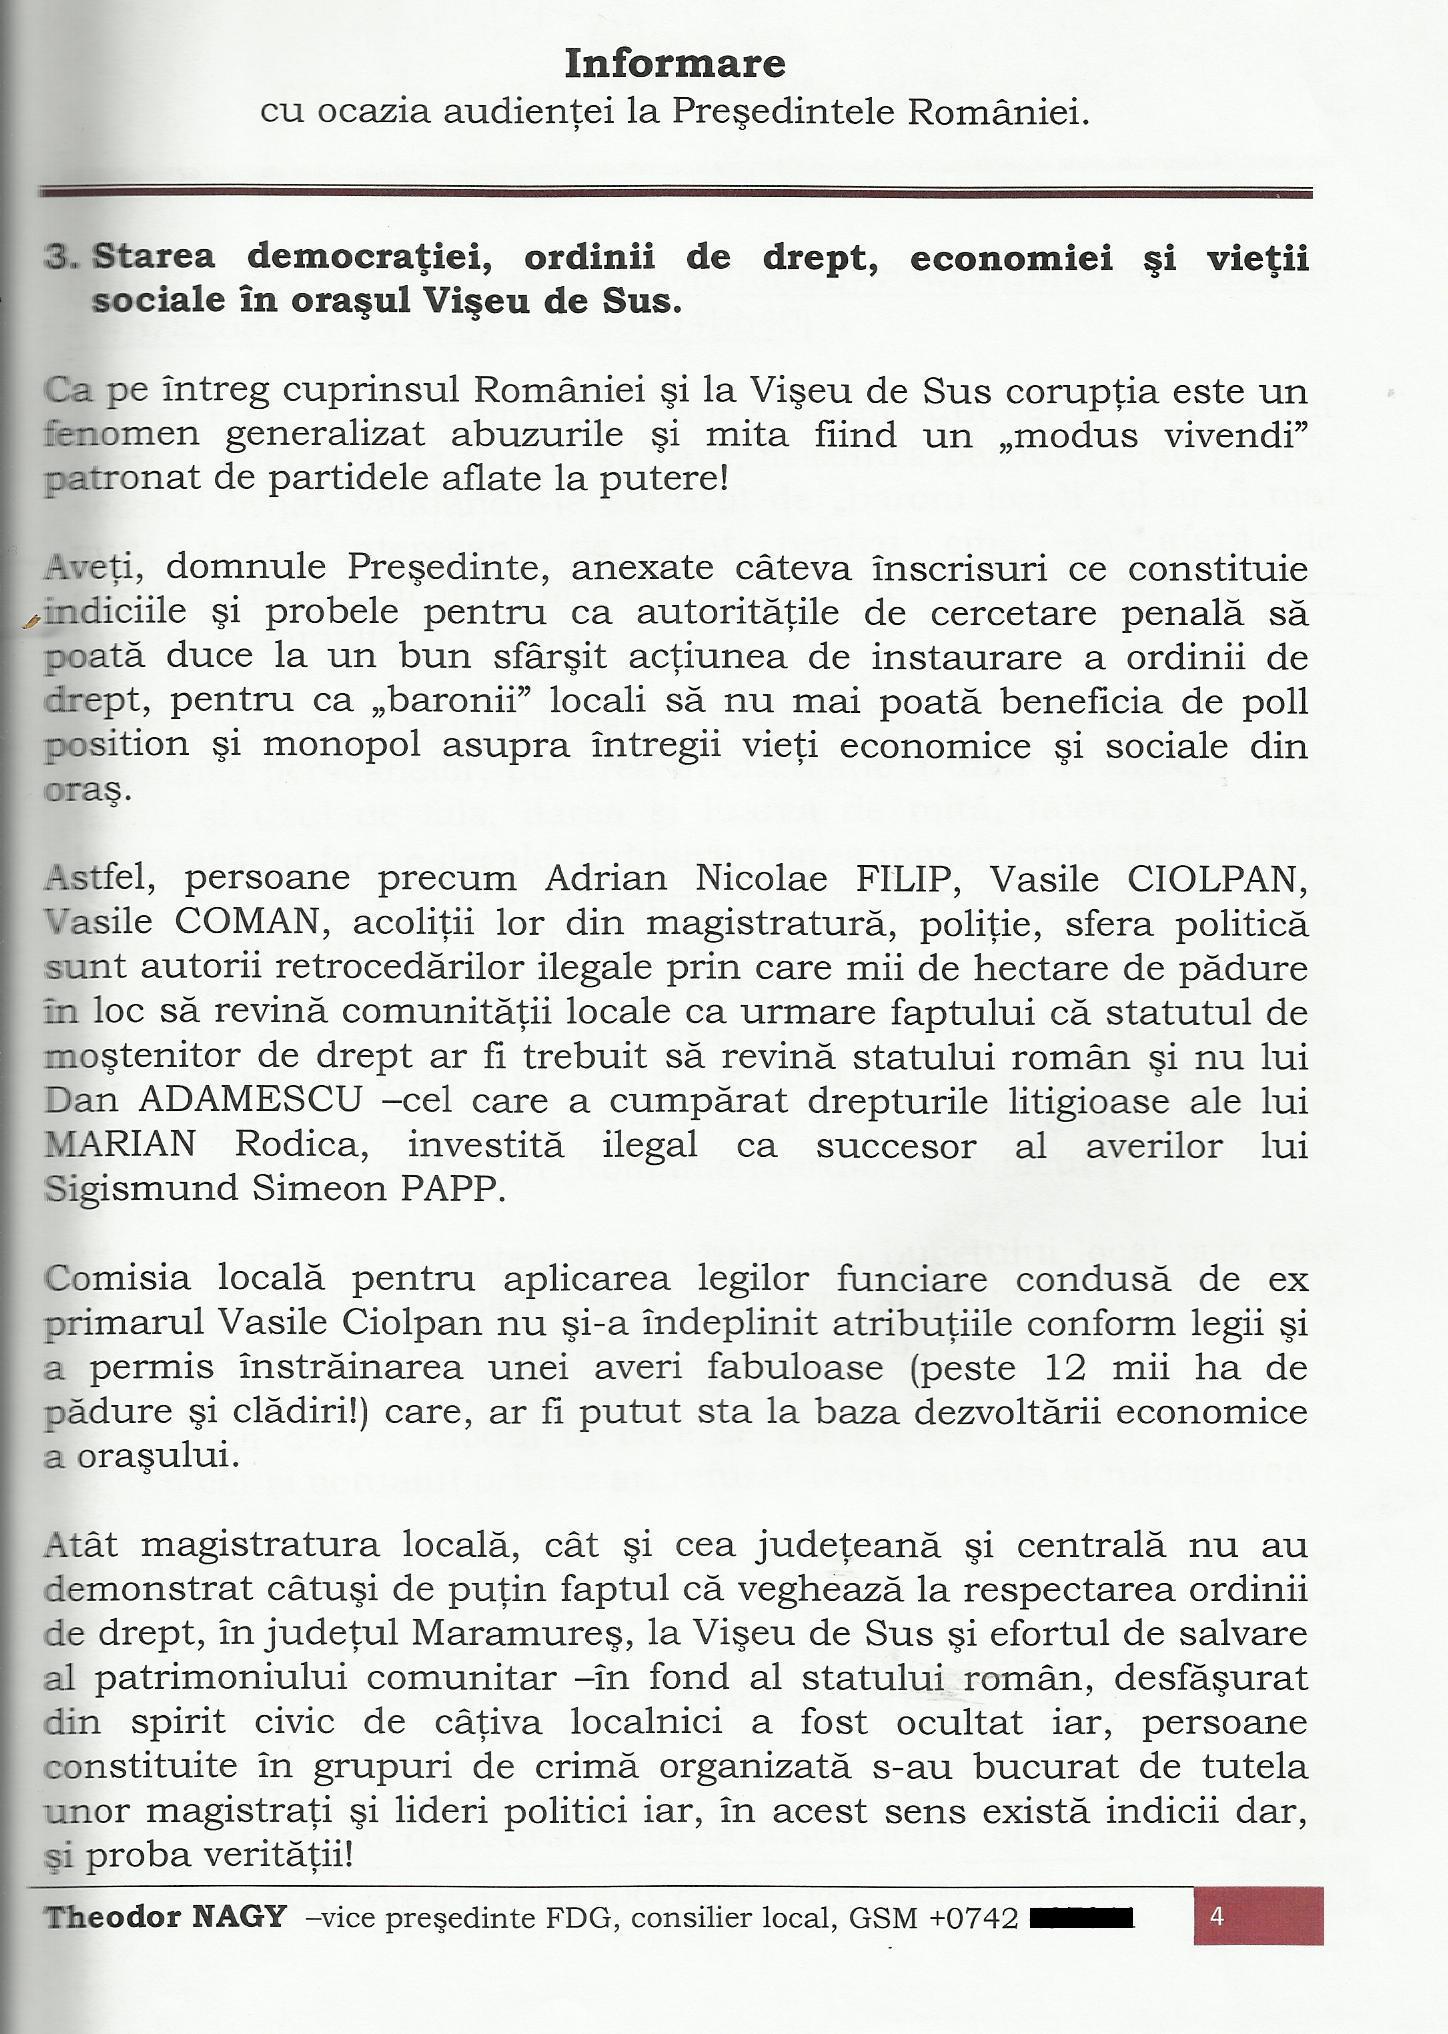 Informare Iohannis script pag. 4 TN